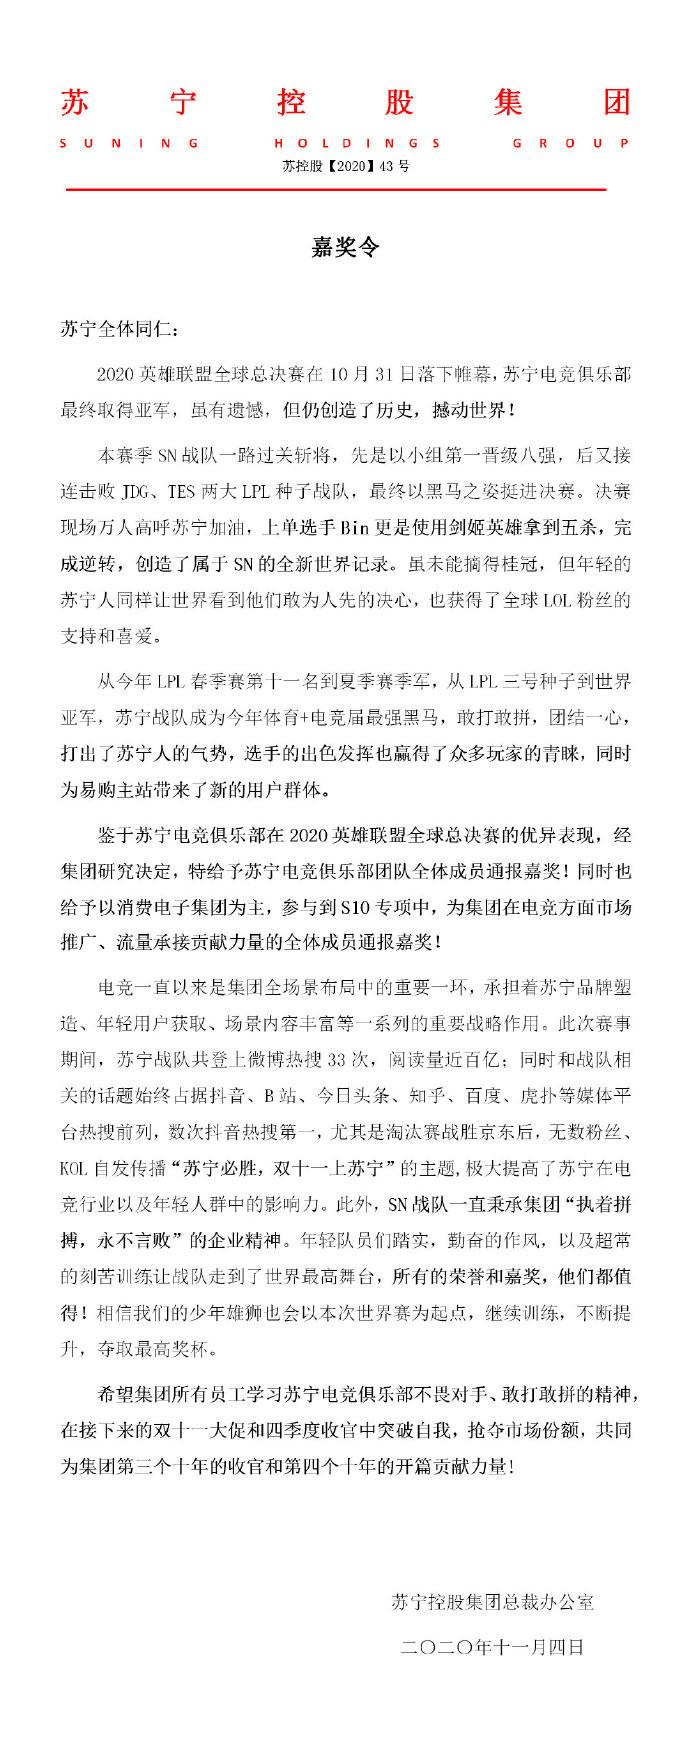 SN斩获全球总决赛亚军 苏宁集团进行内部嘉奖